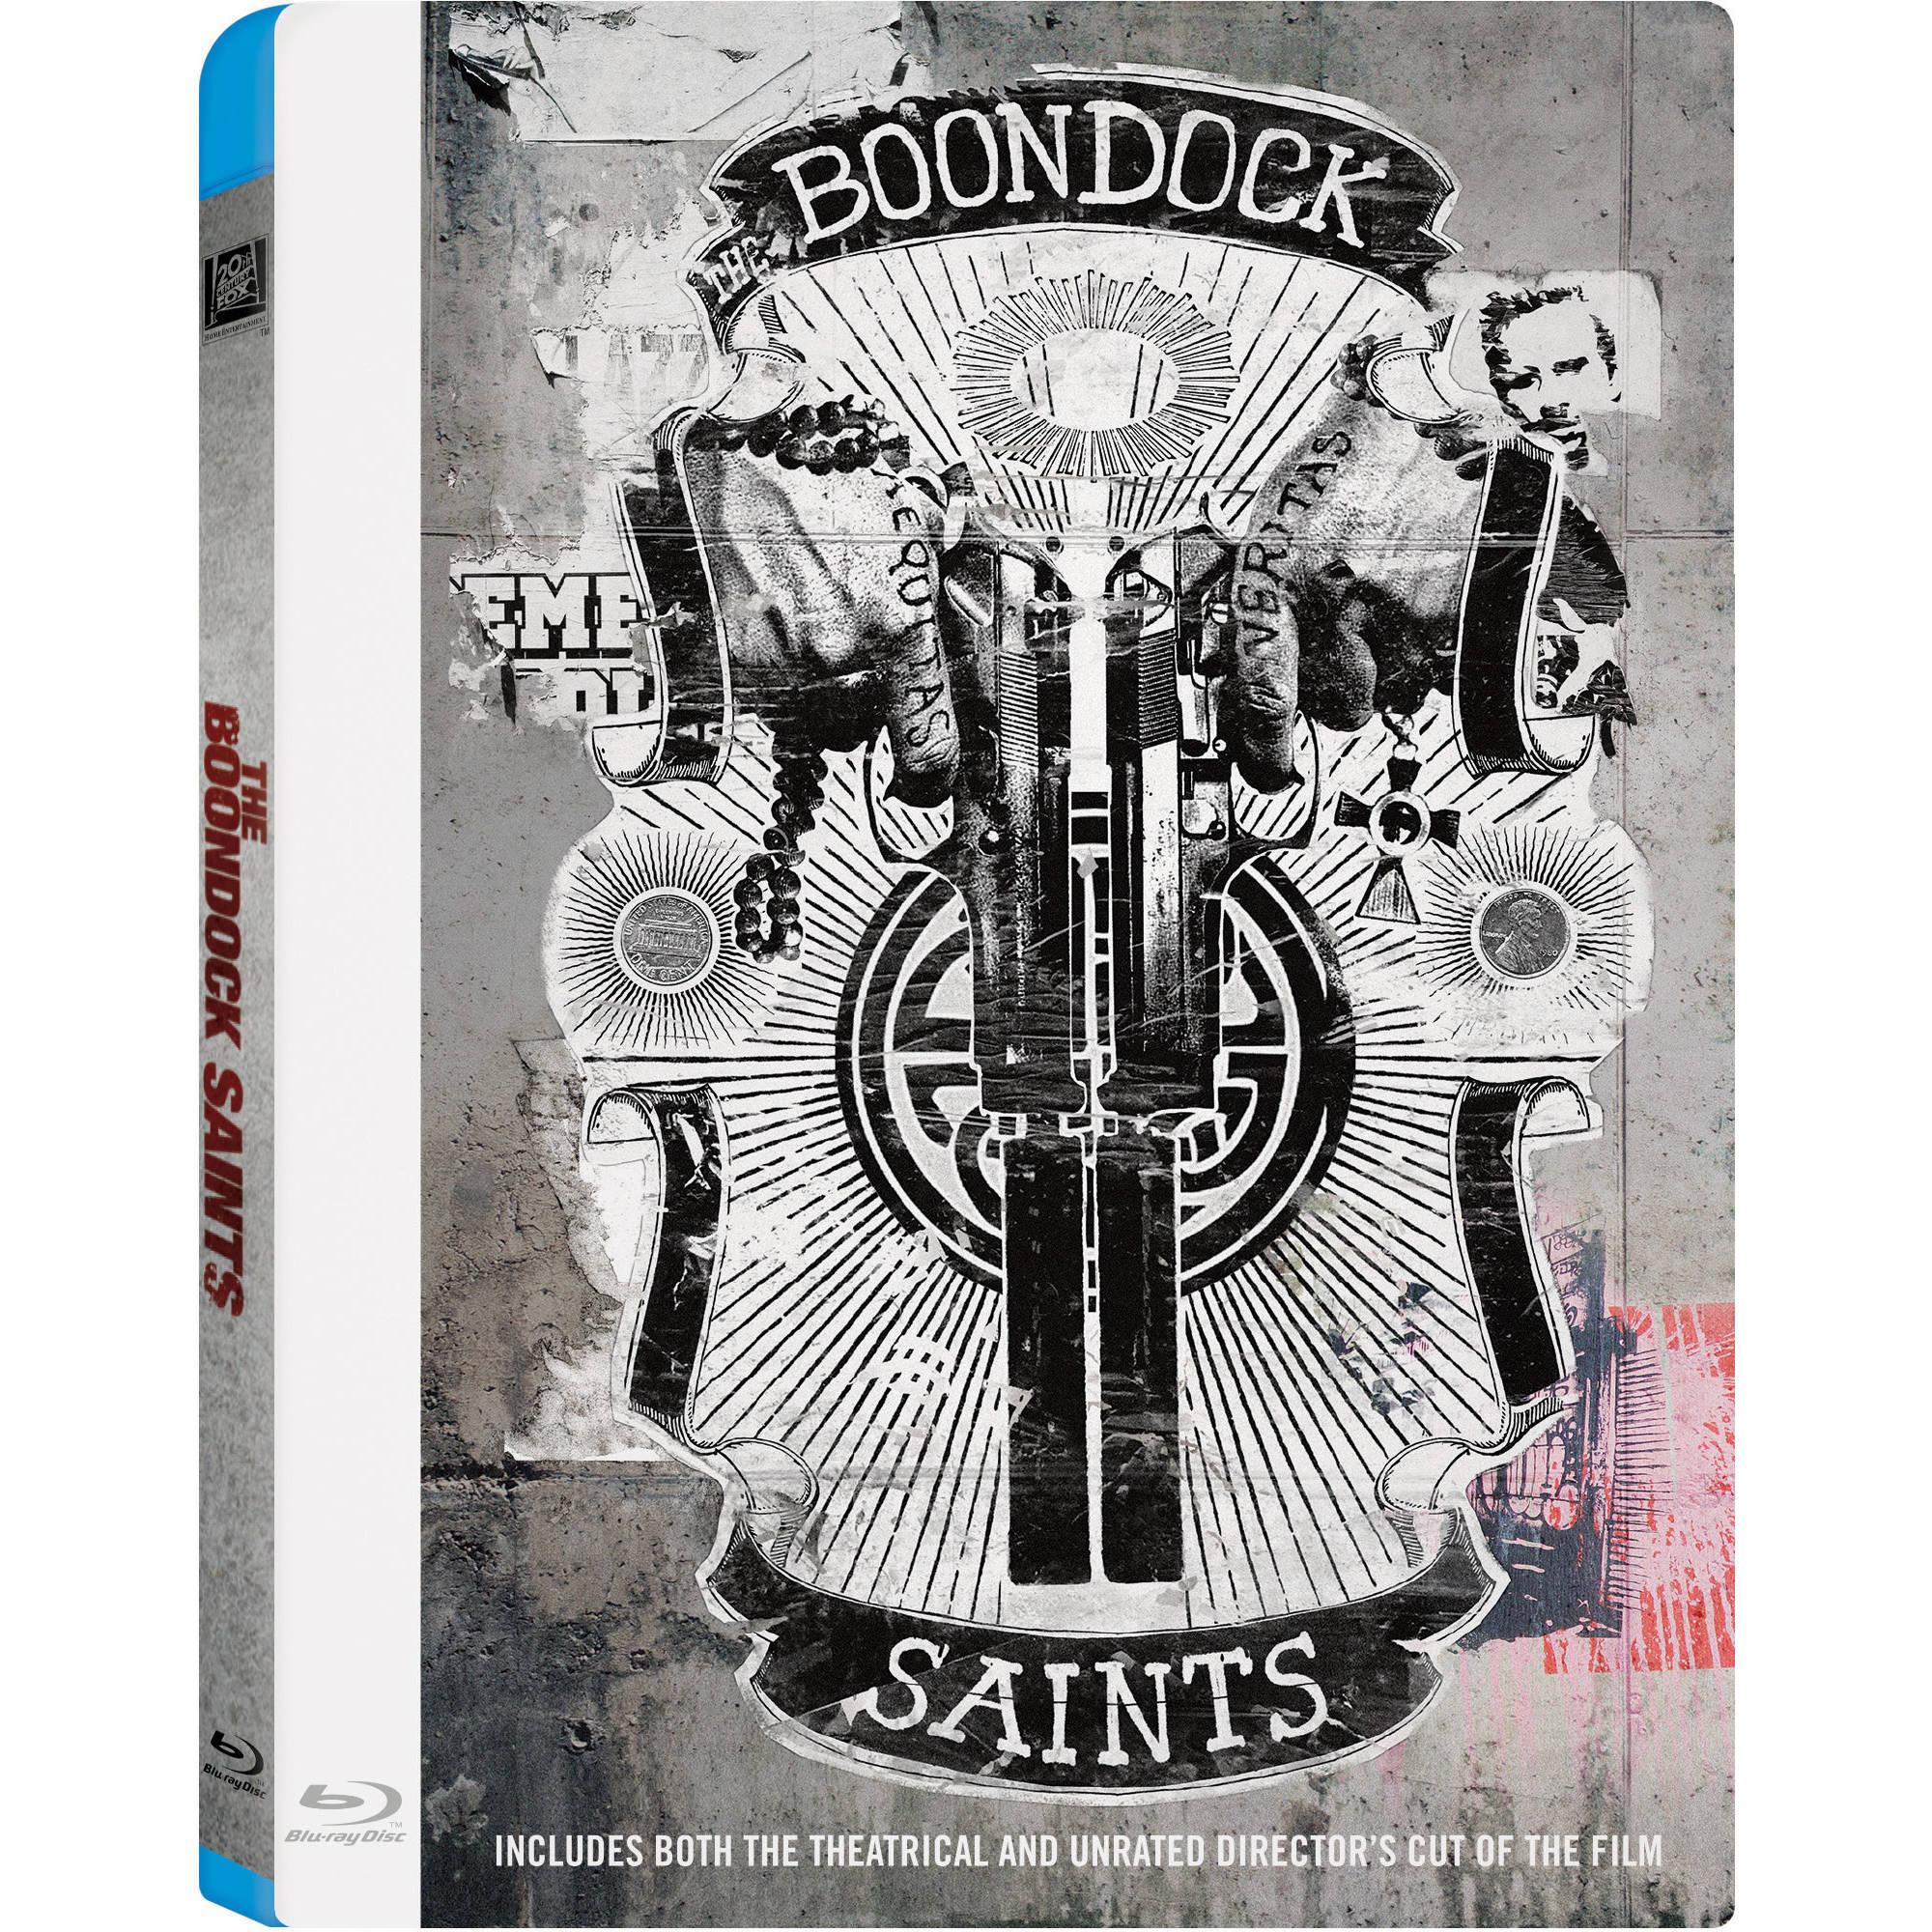 The Boondock Saints (Blu-ray) (Widescreen)